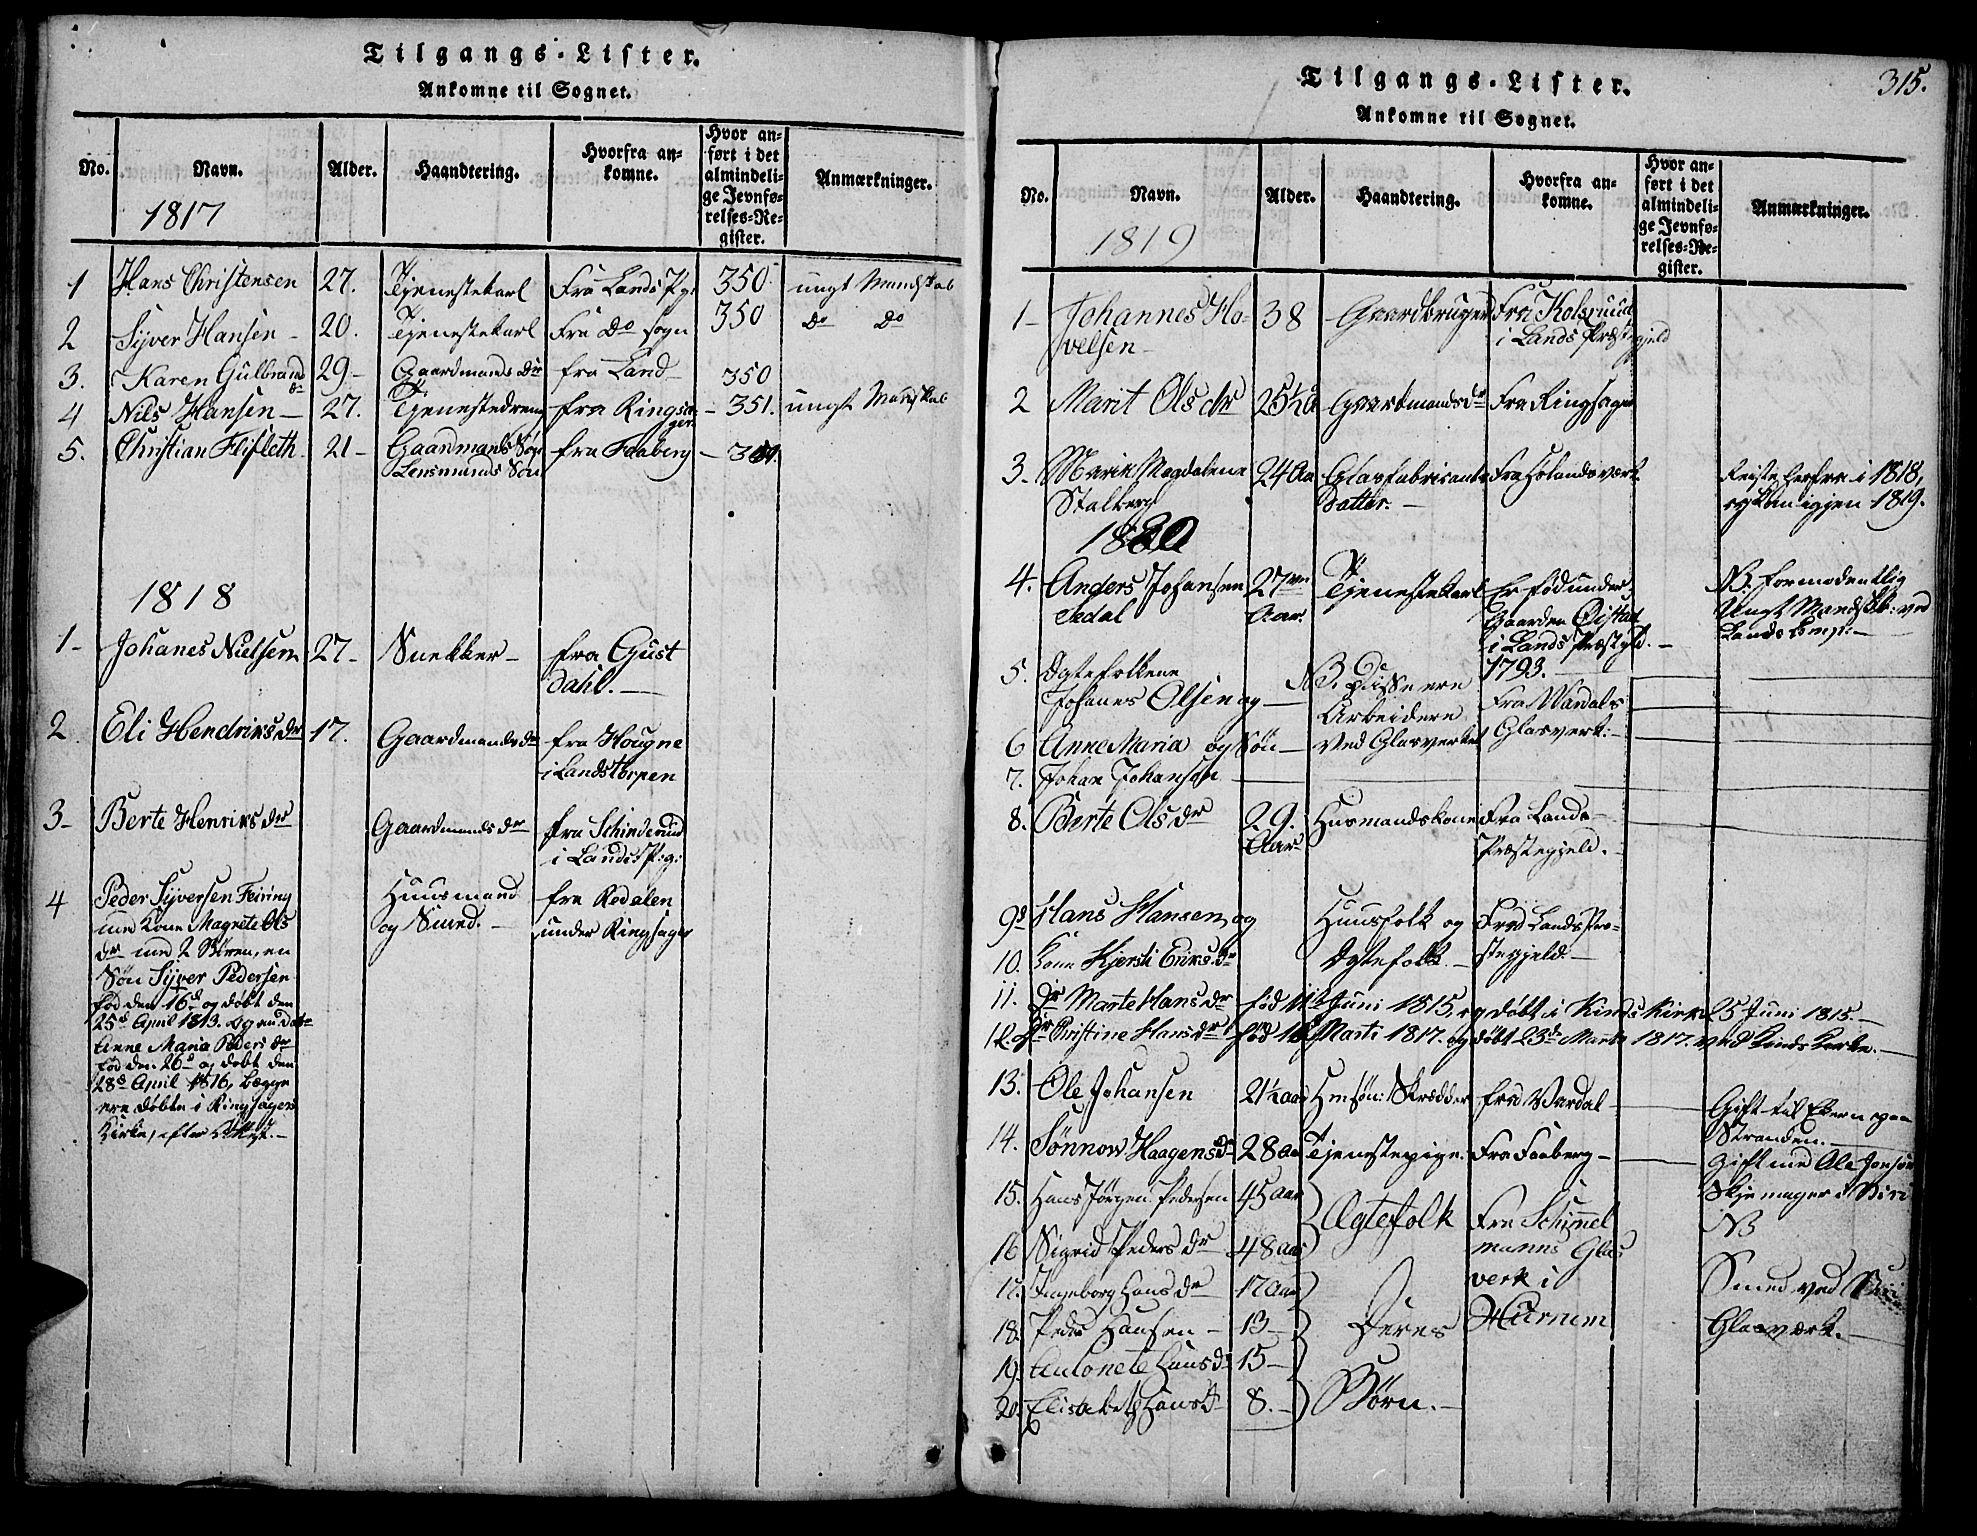 SAH, Biri prestekontor, Klokkerbok nr. 1, 1814-1828, s. 315